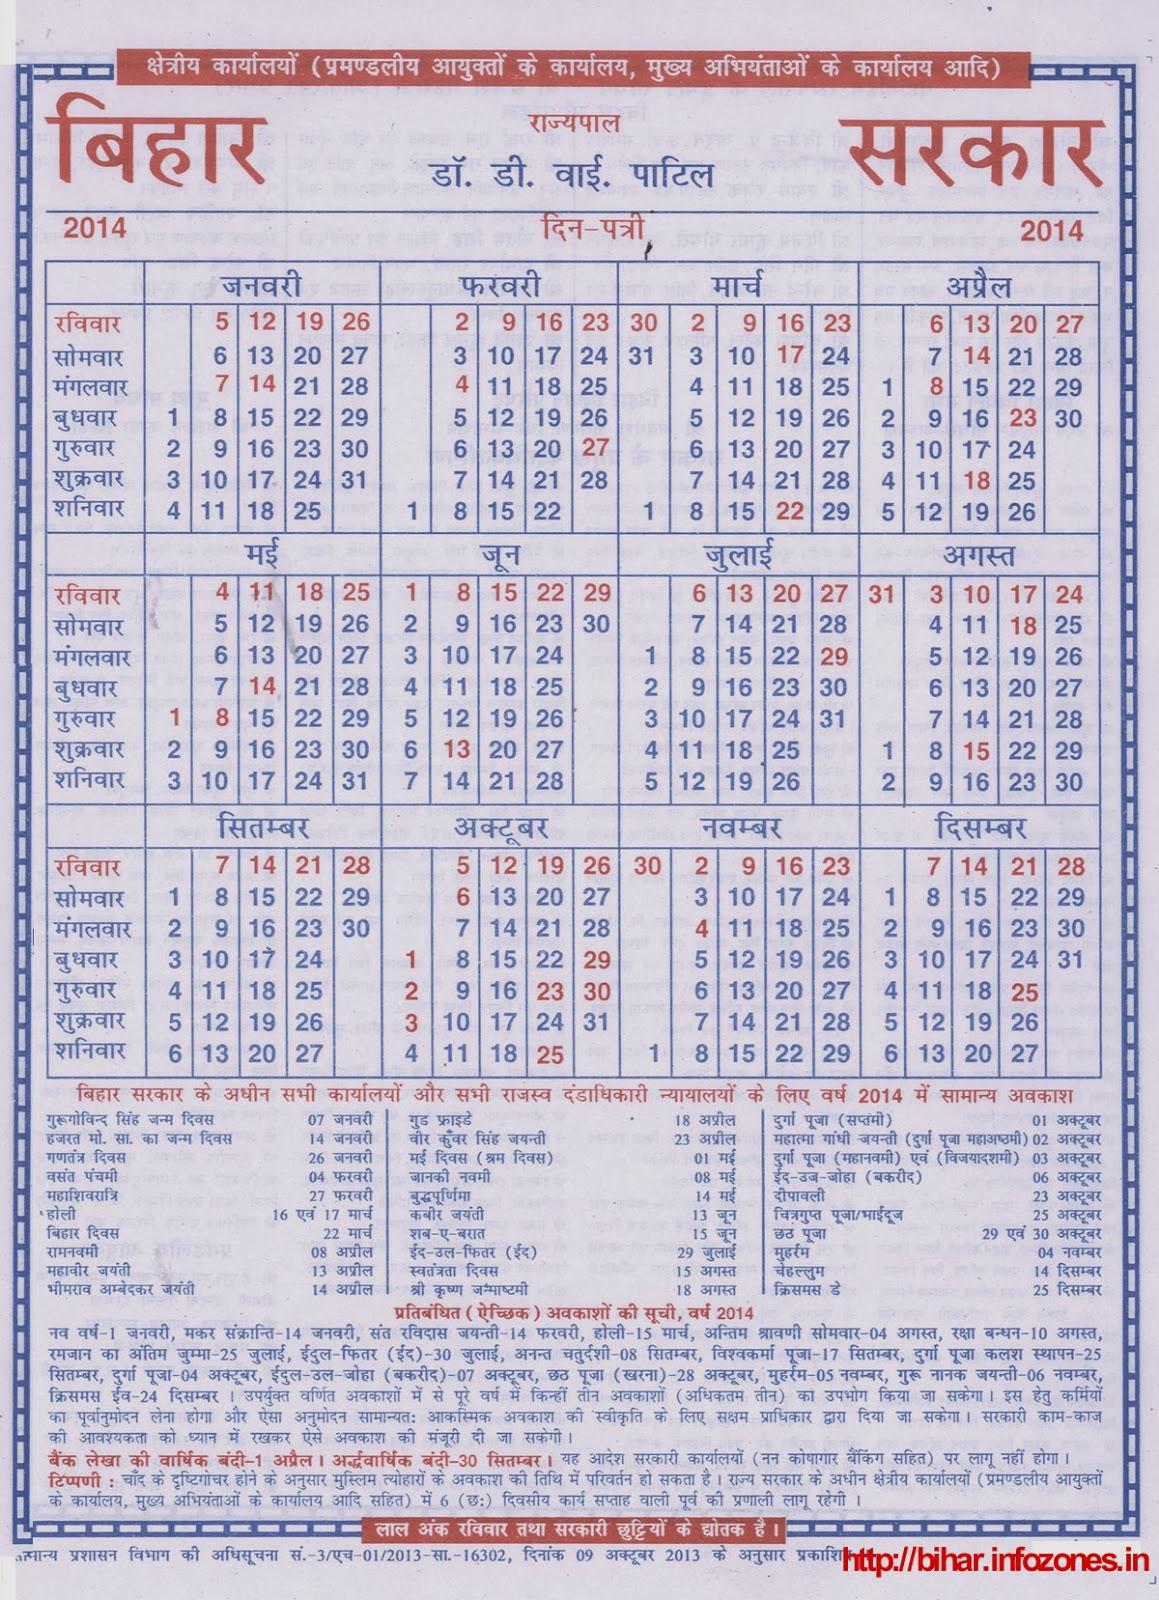 Bihar Government Calendar 2014 with Bihar Govt Calendar 2018